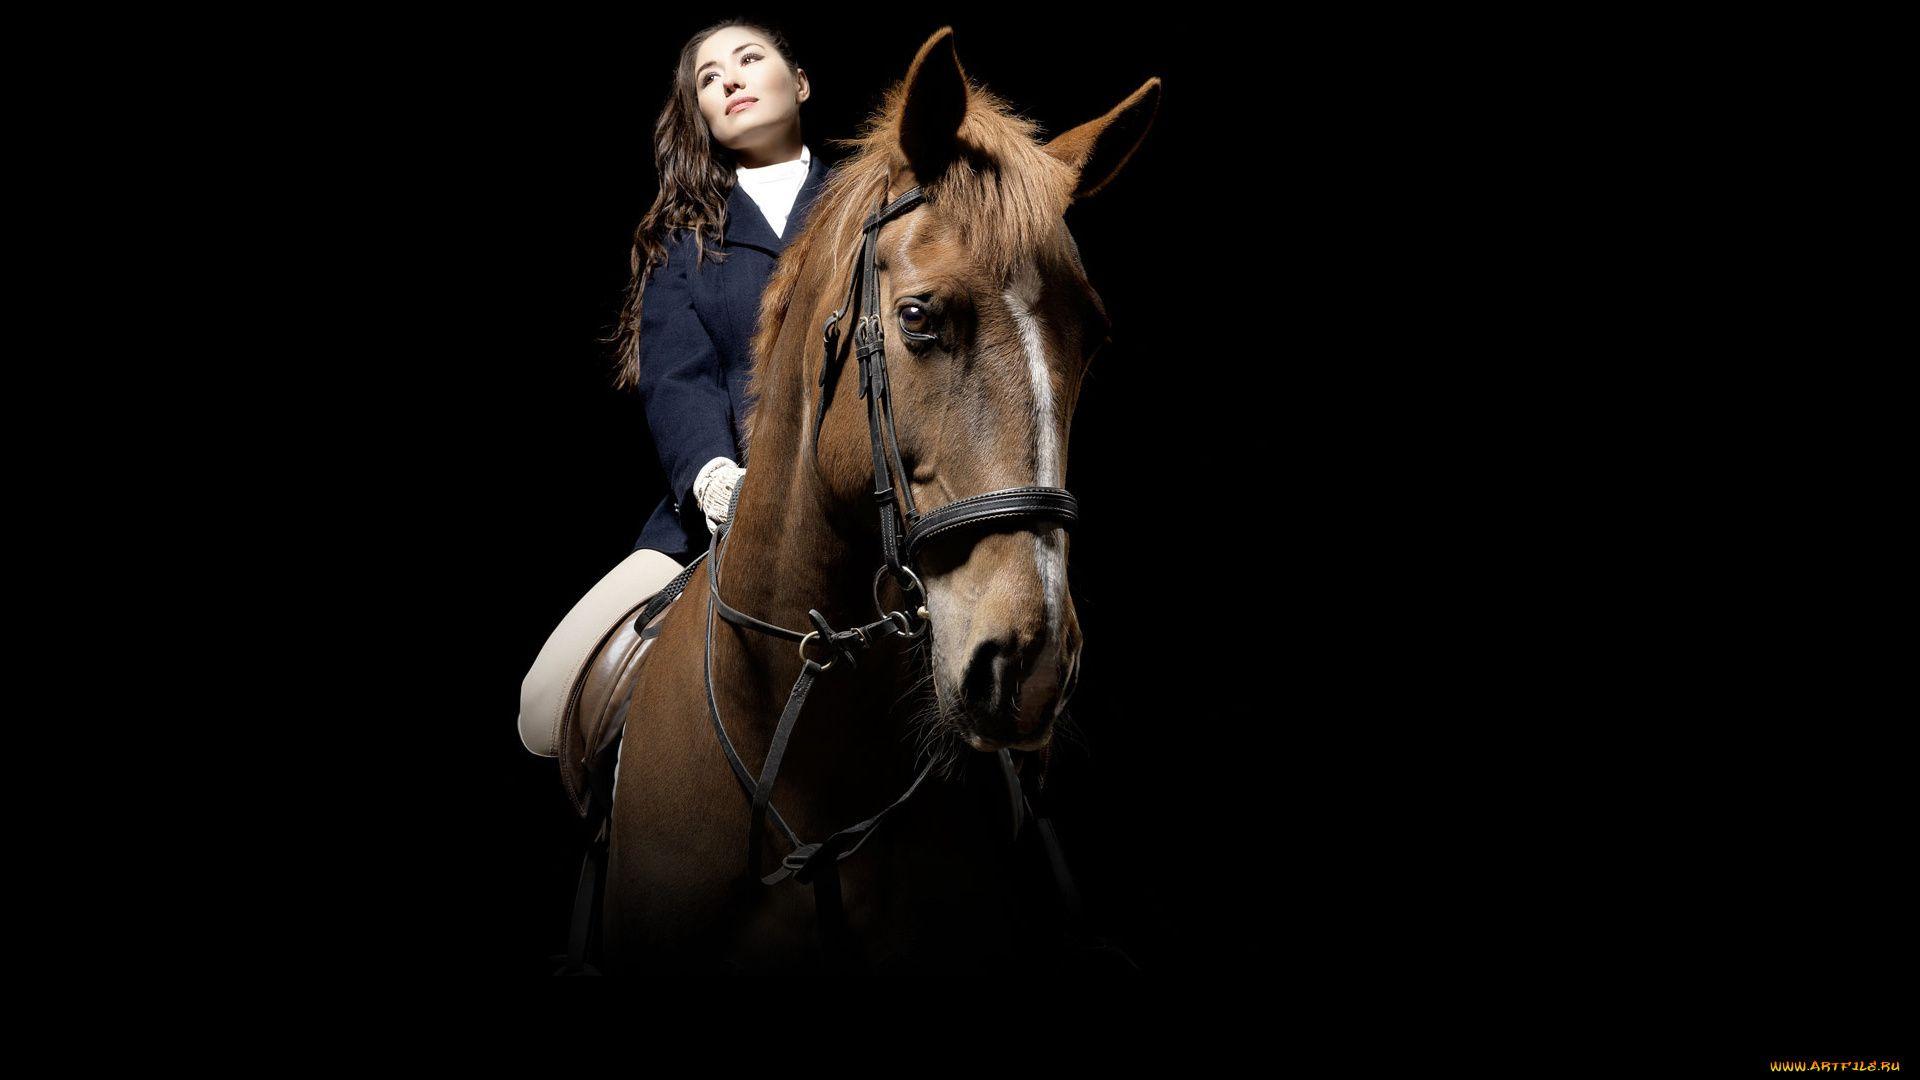 Equestrian free download wallpaper